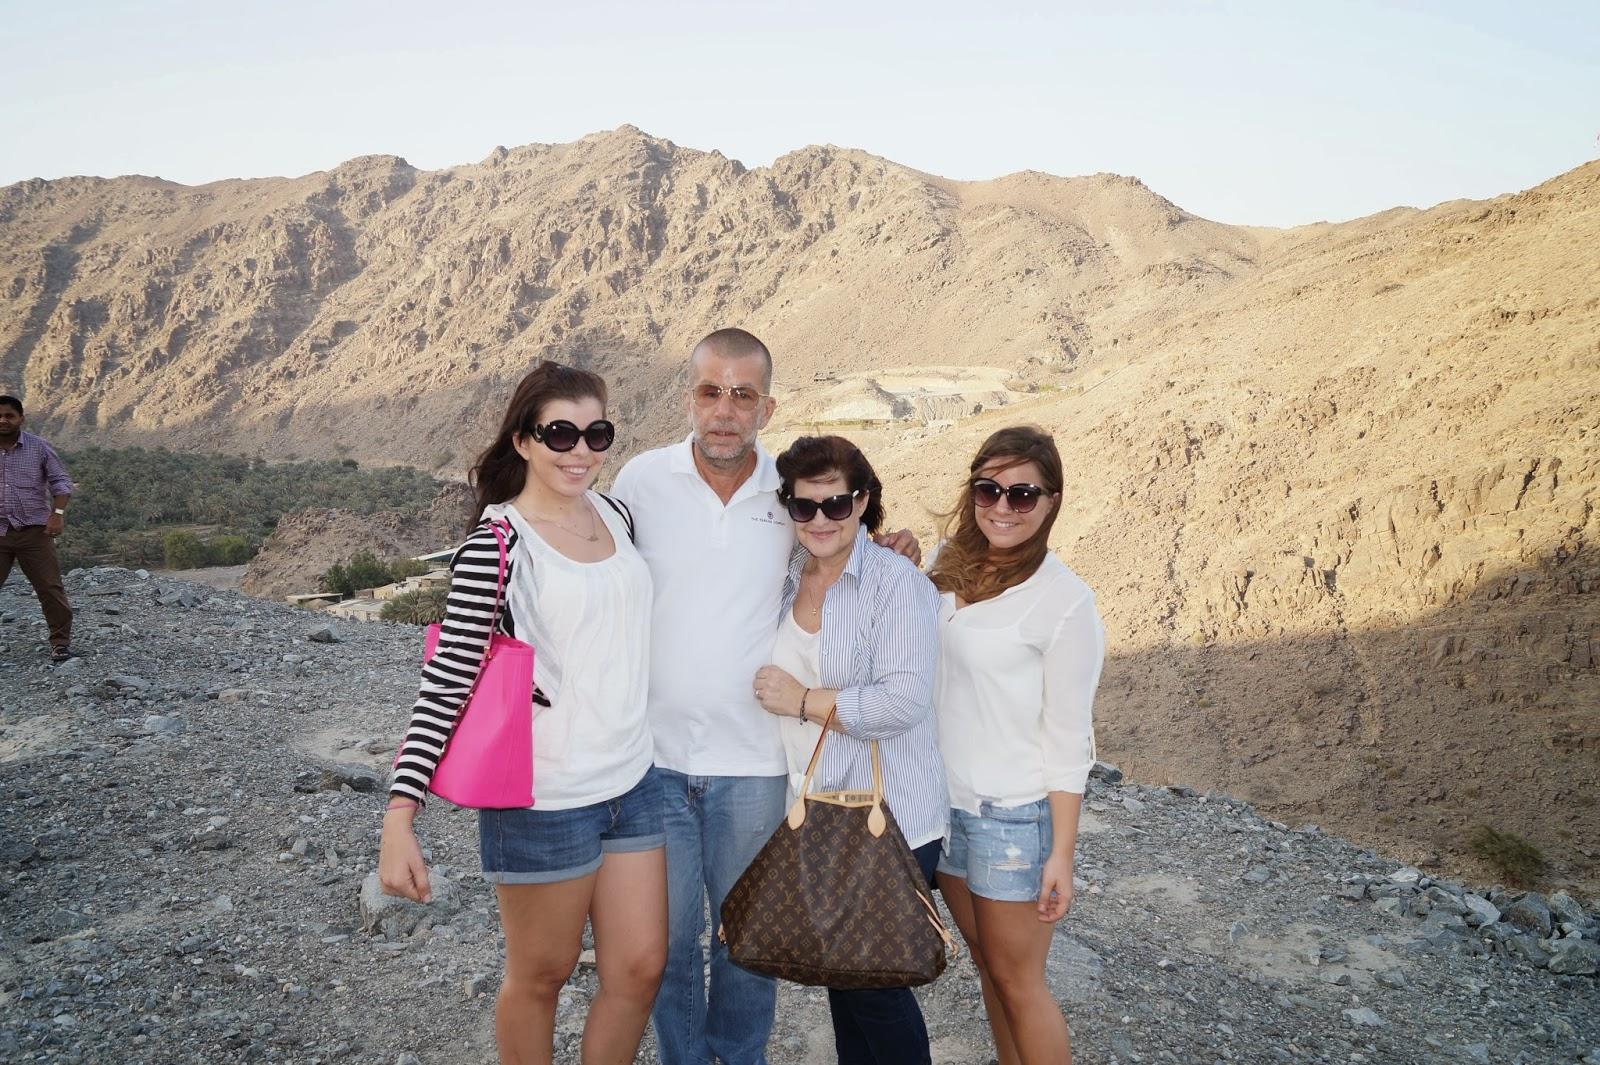 I ♥ This Family Photo